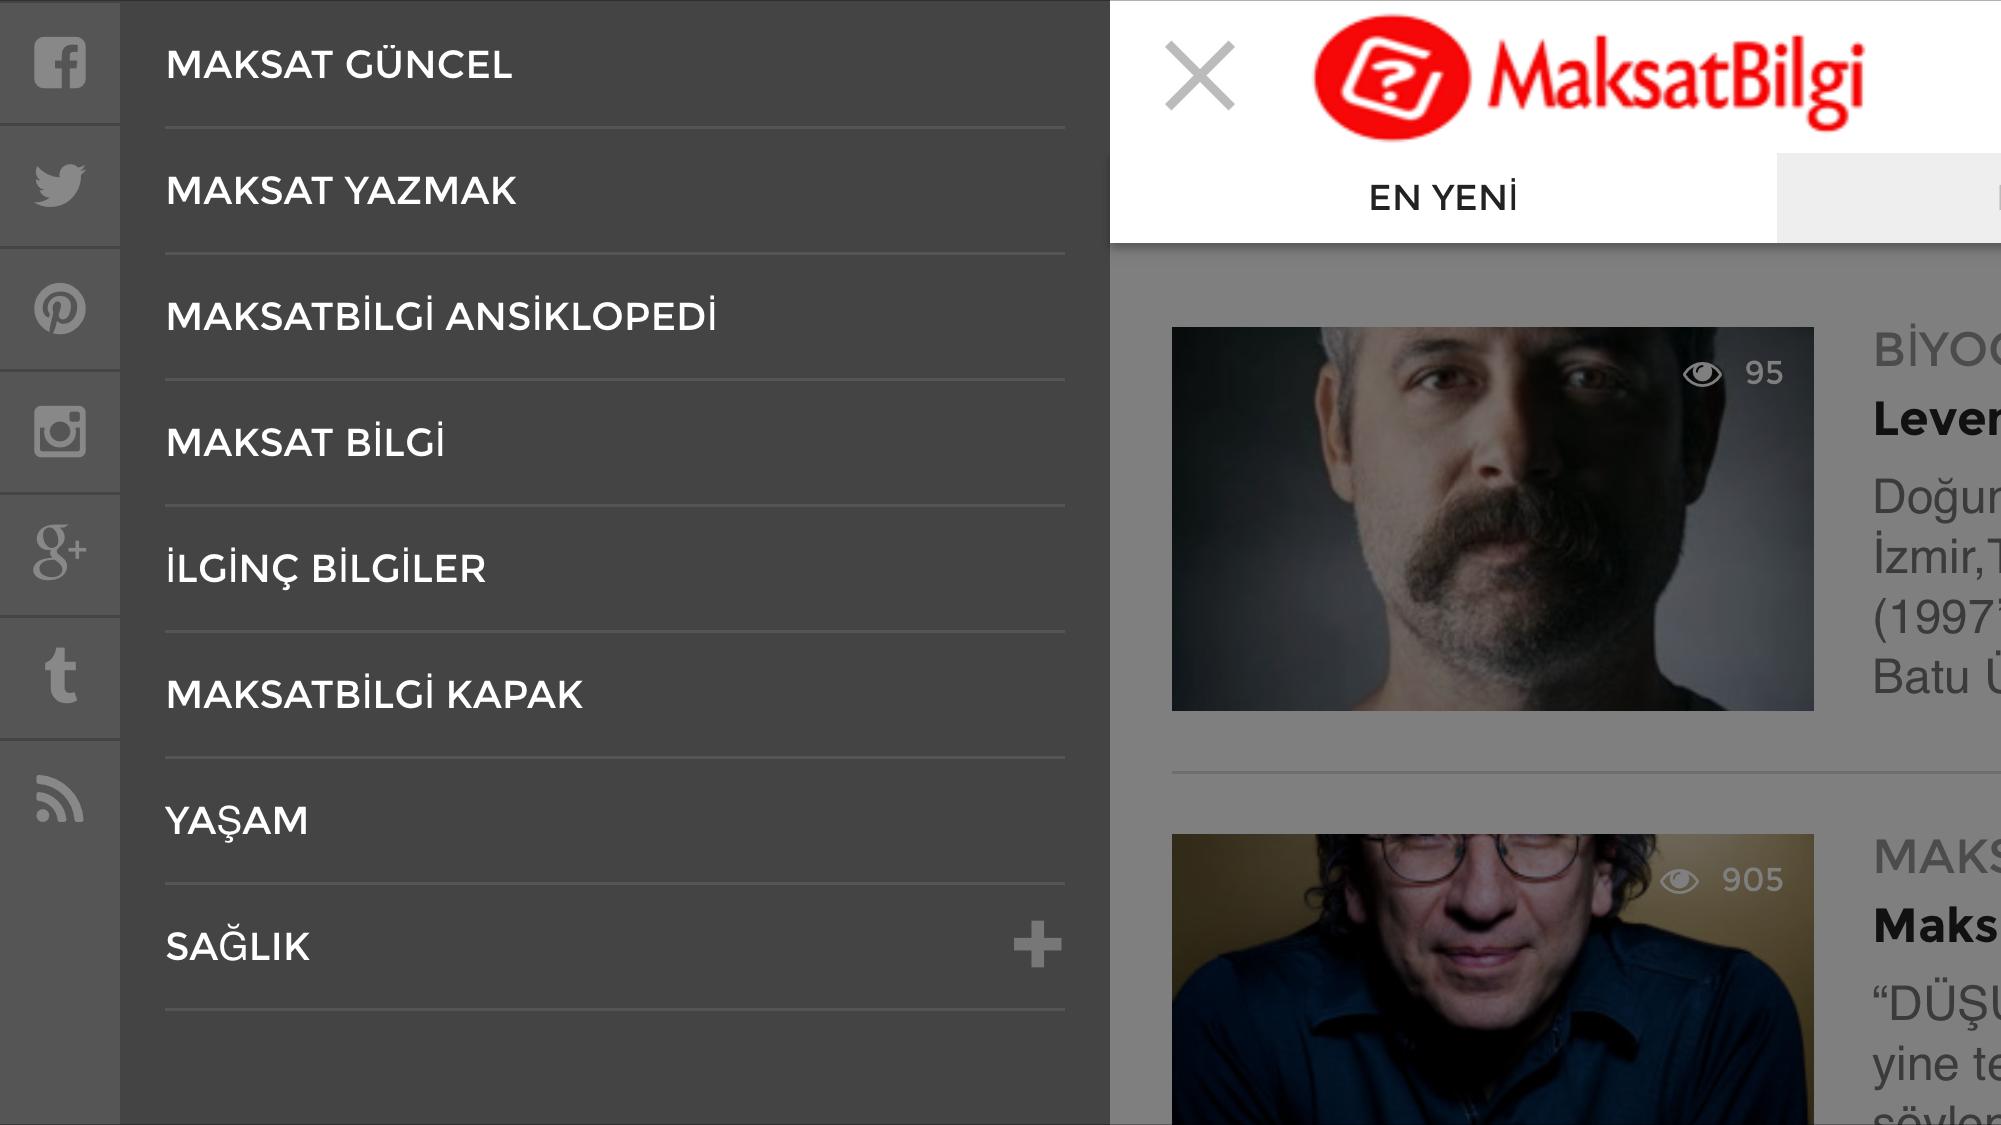 maksatbilgi v3 slide menu - MaksatBilgi v3